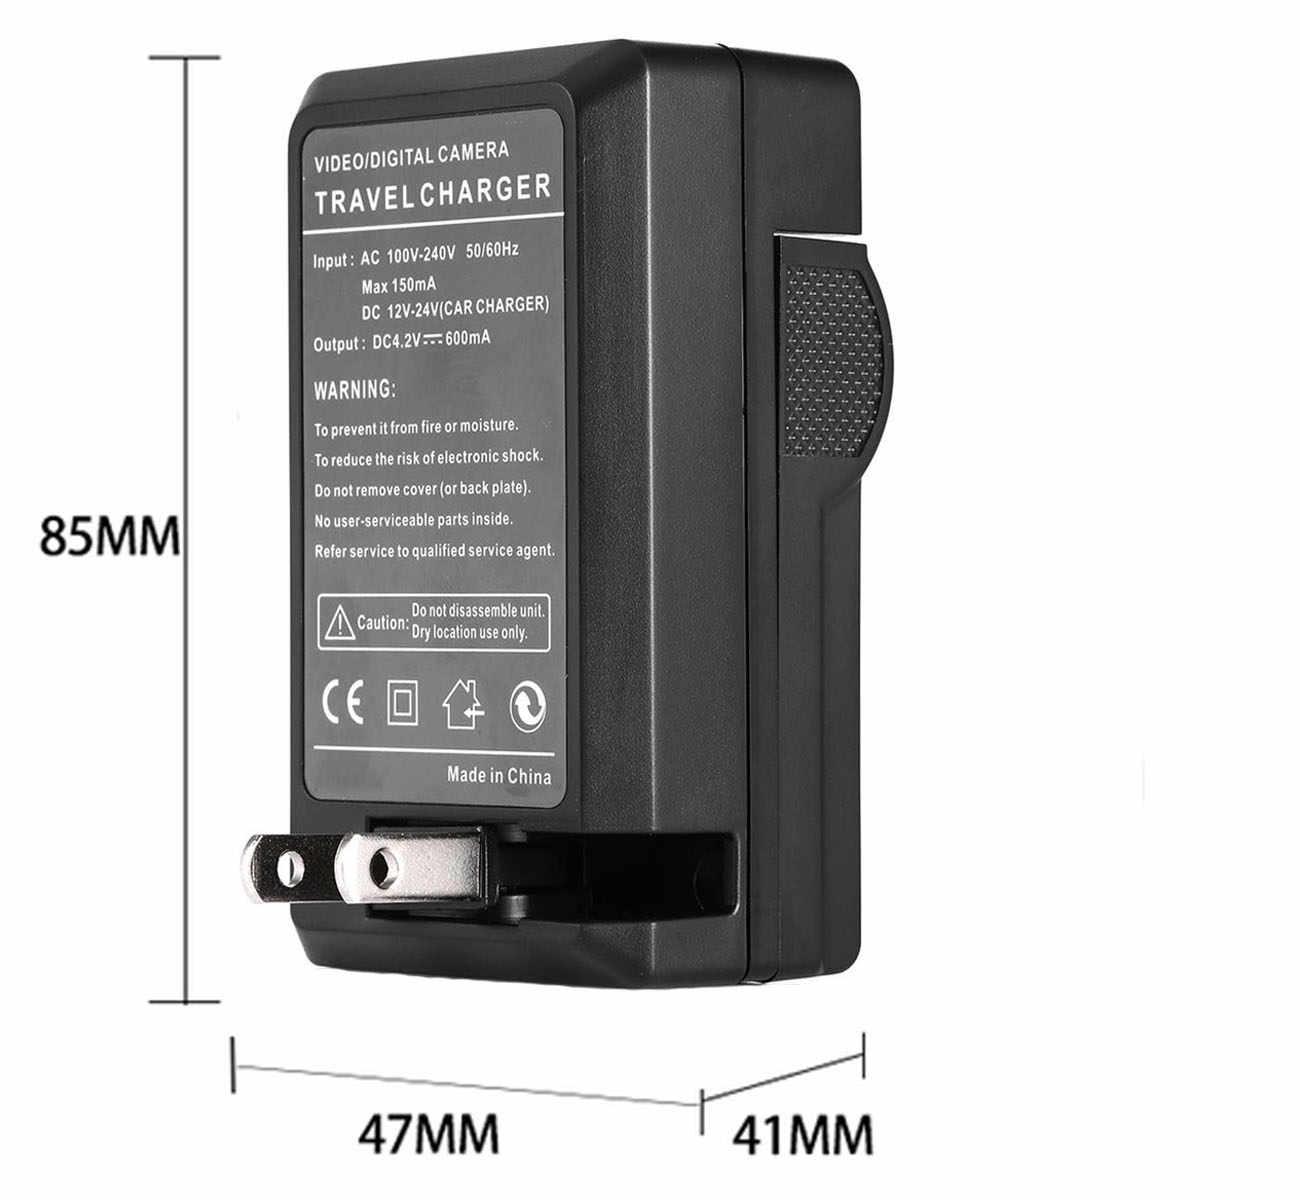 Micro USB Battery Charger for JVC Everio GZ-MG20U GZ-MG30U GZ-MG40U GZ-MG50U GZ-MG70U Digital Camcorder GZ-MG21U